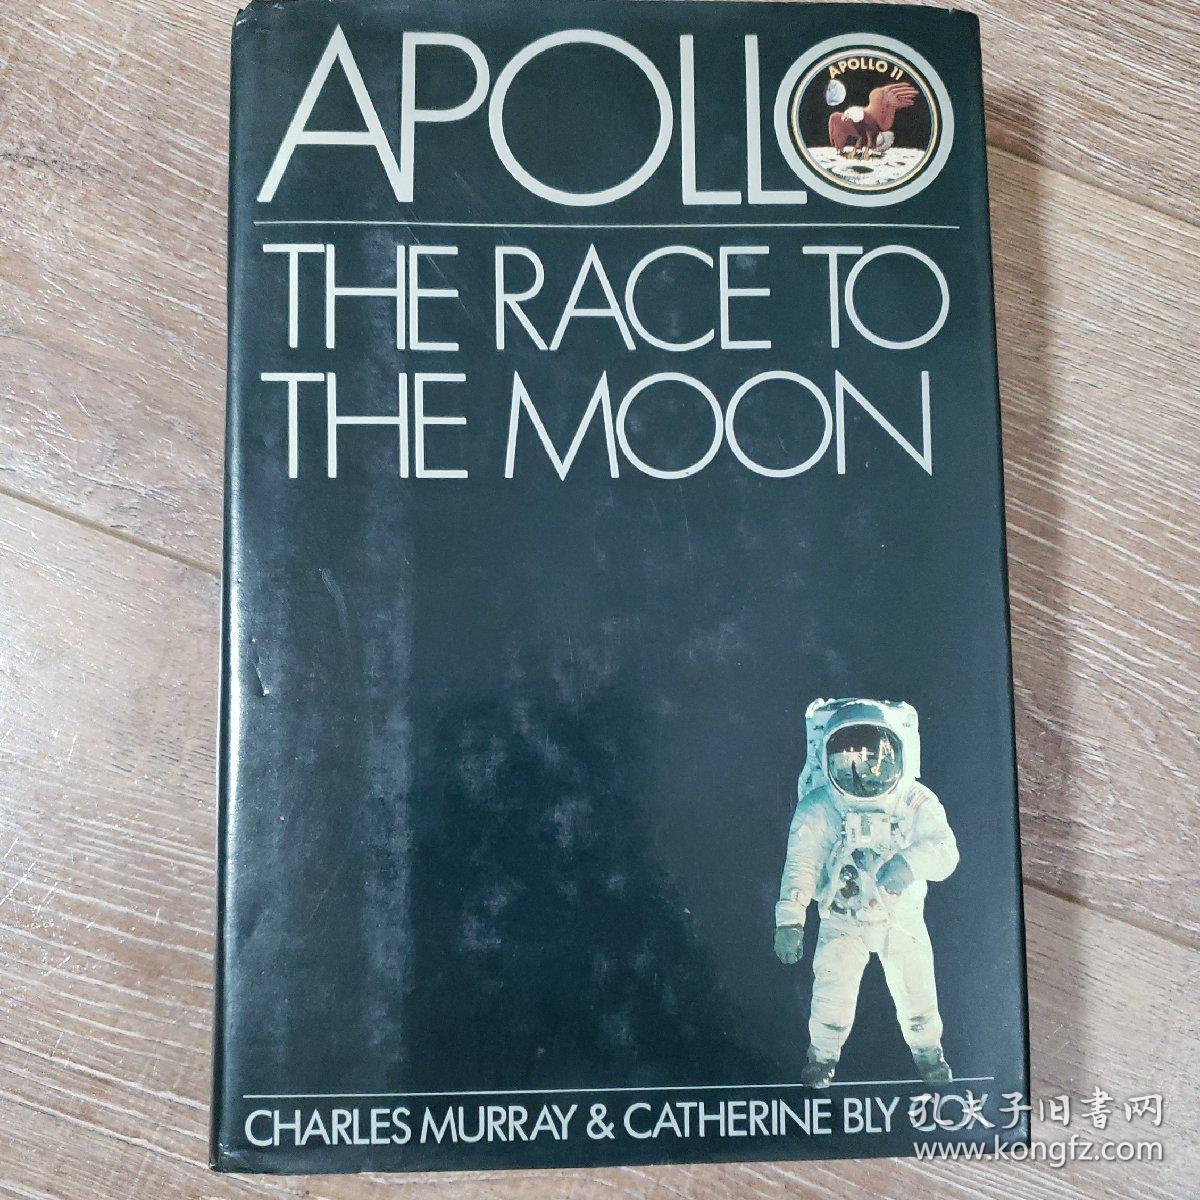 Apollo the race to the moon 阿波罗月球探险 天文 科普